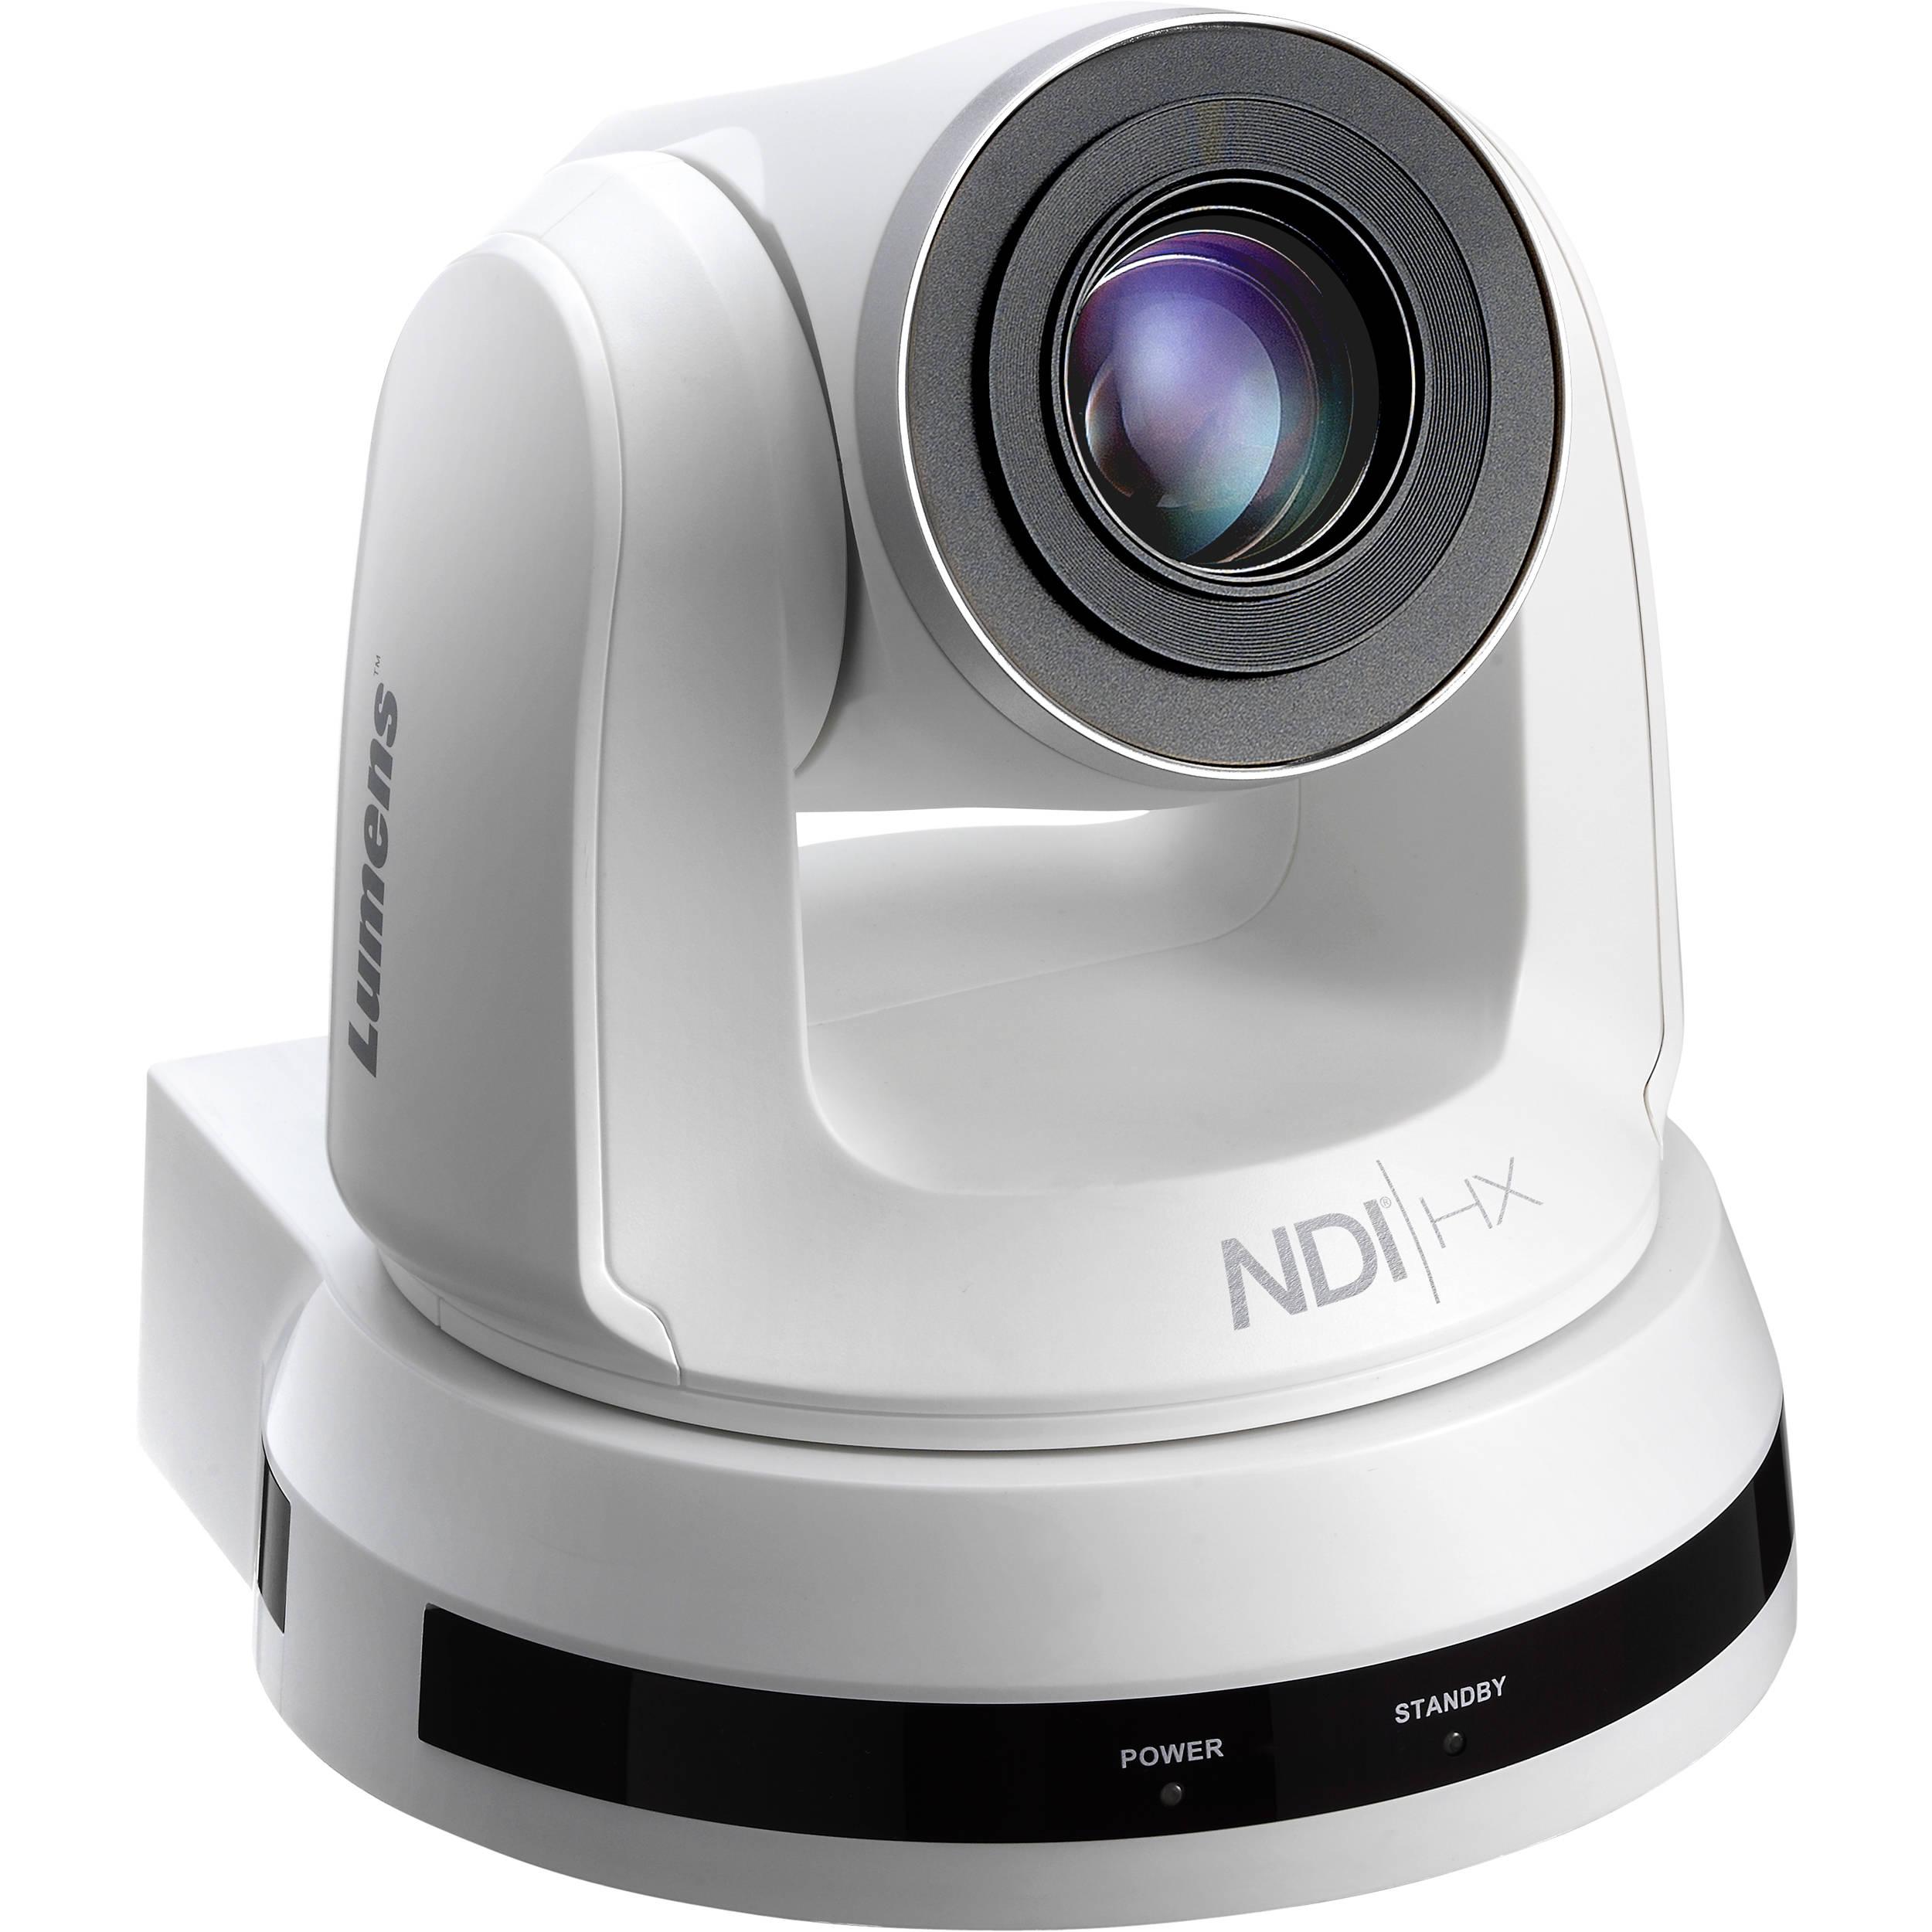 Garage Lumens Optical Ptz Ip Ndi Lumens Optical Ptz Ip 1080p 60fps Security Camera 1080p 60fps Camera Board dpreview 1080p 60fps Camera